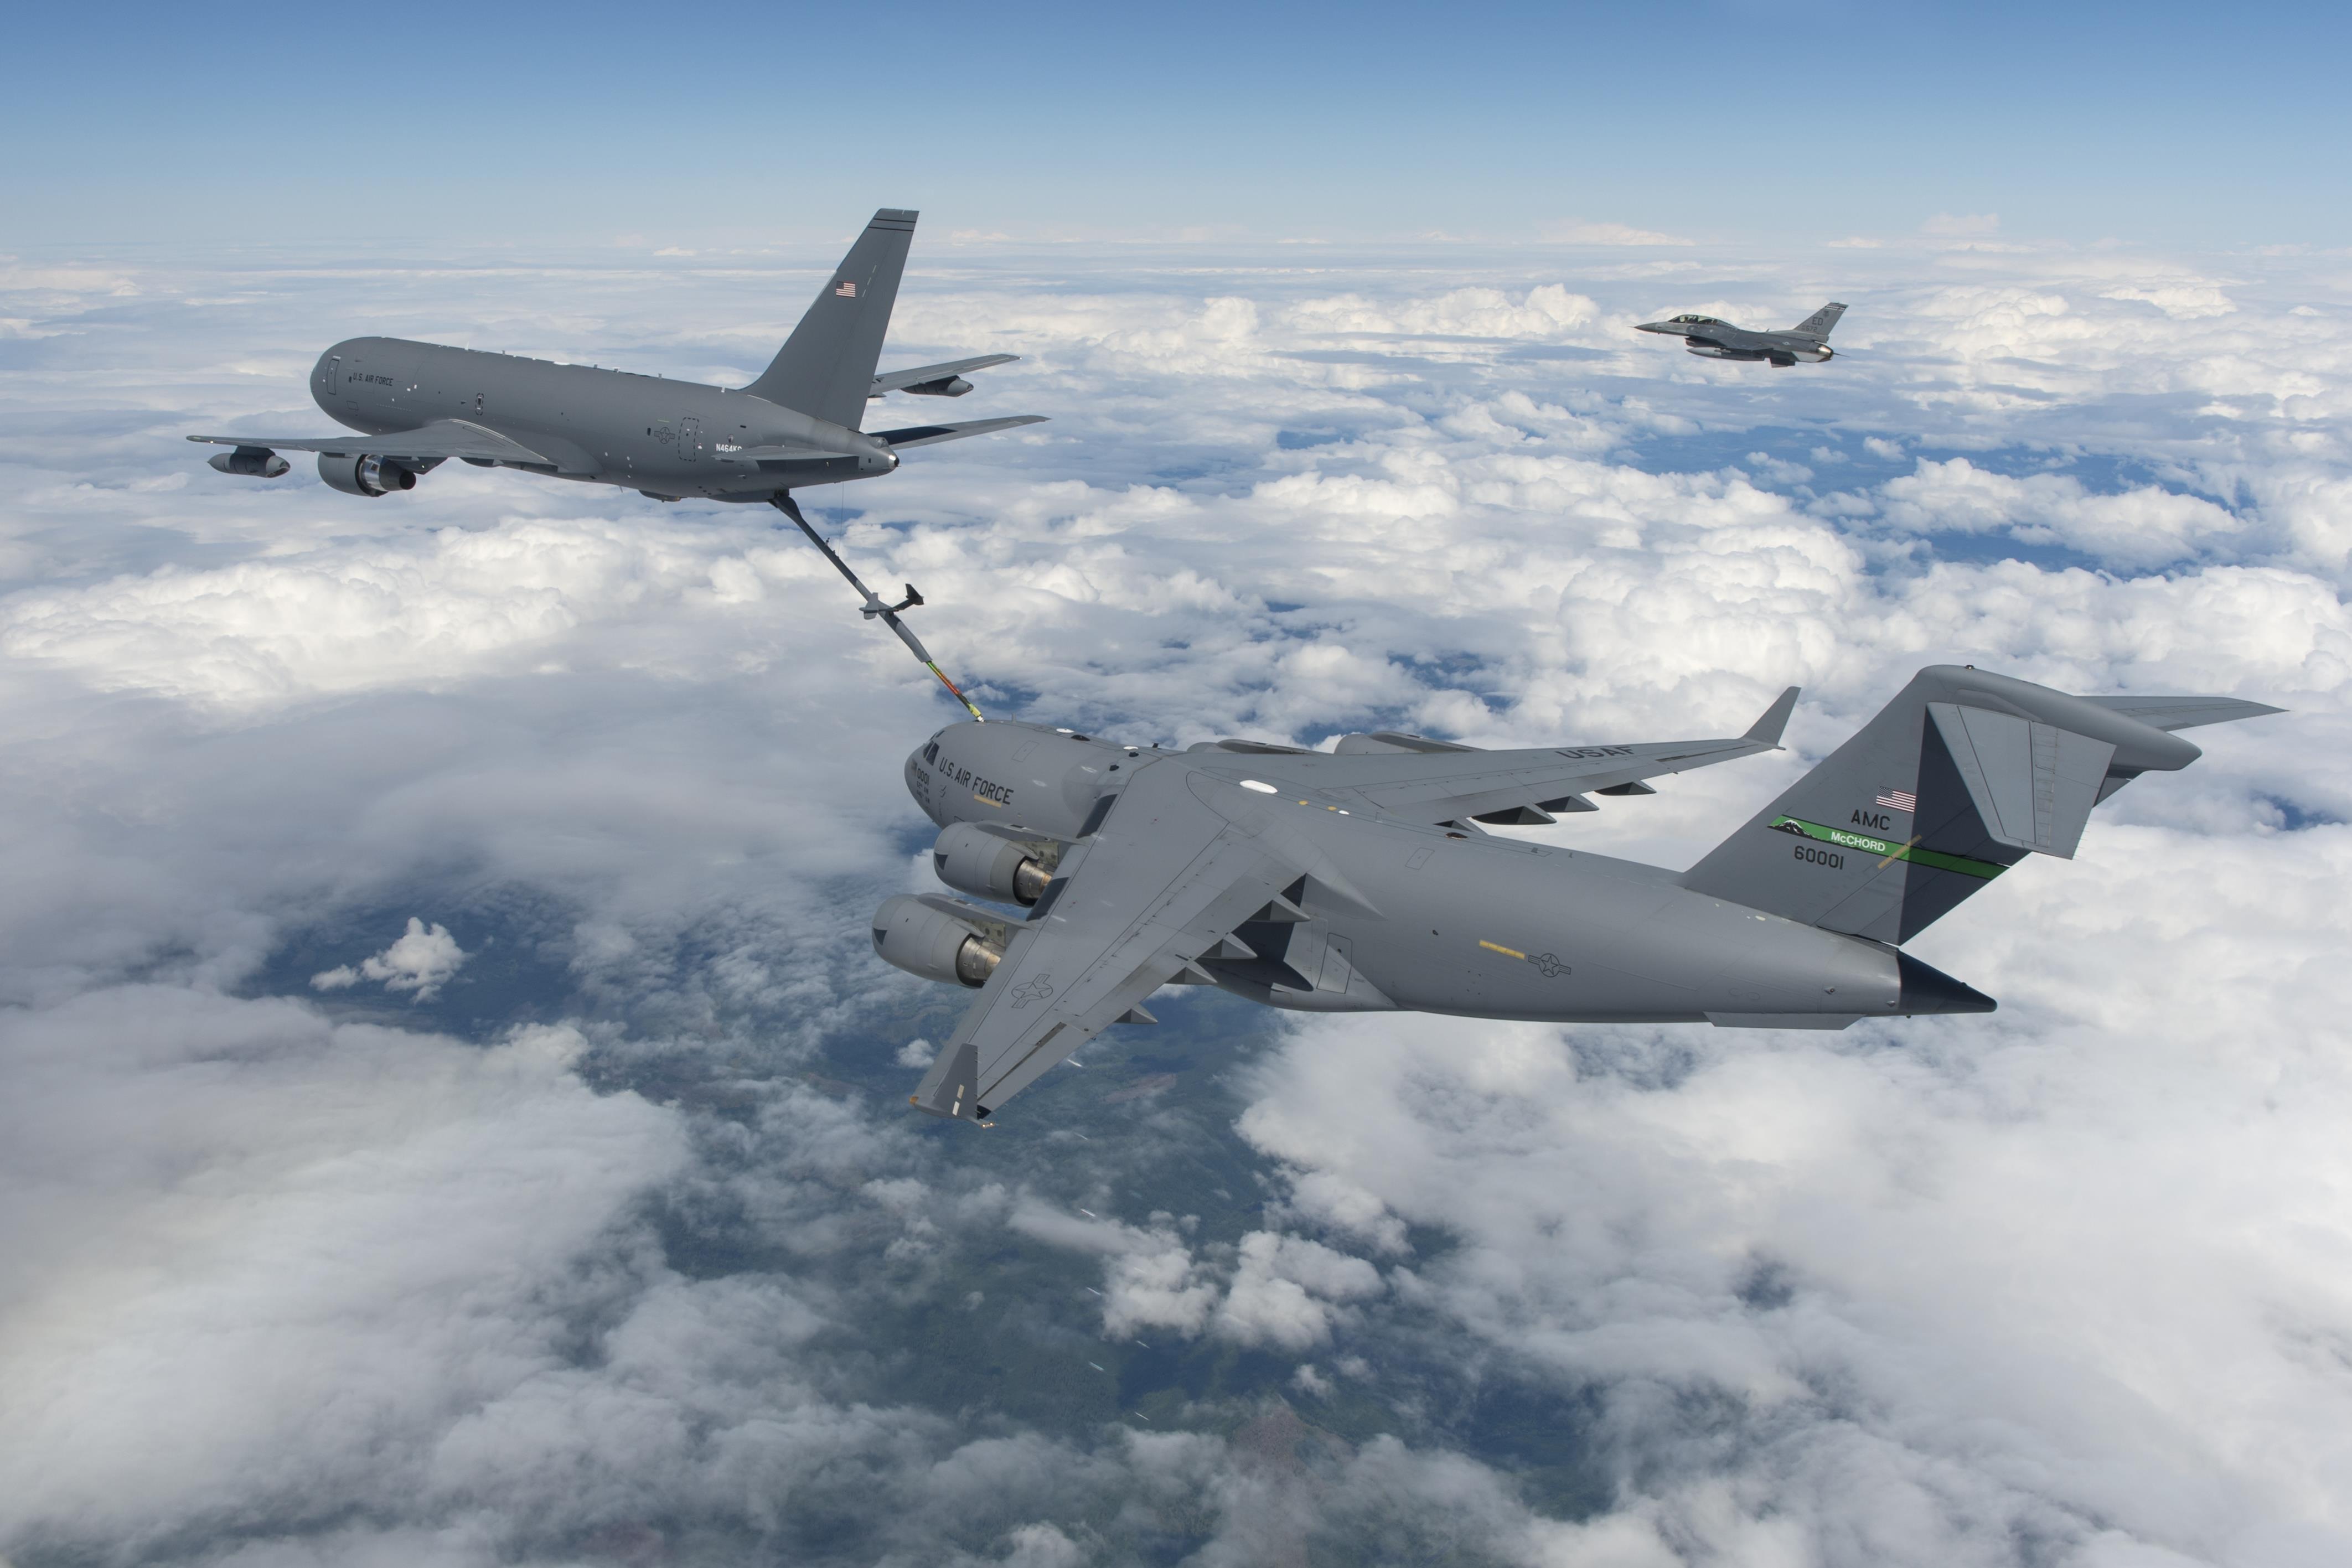 KC-46A refuels USAF C-17A 12-07-16 [Boeing/Paul Weatherman]